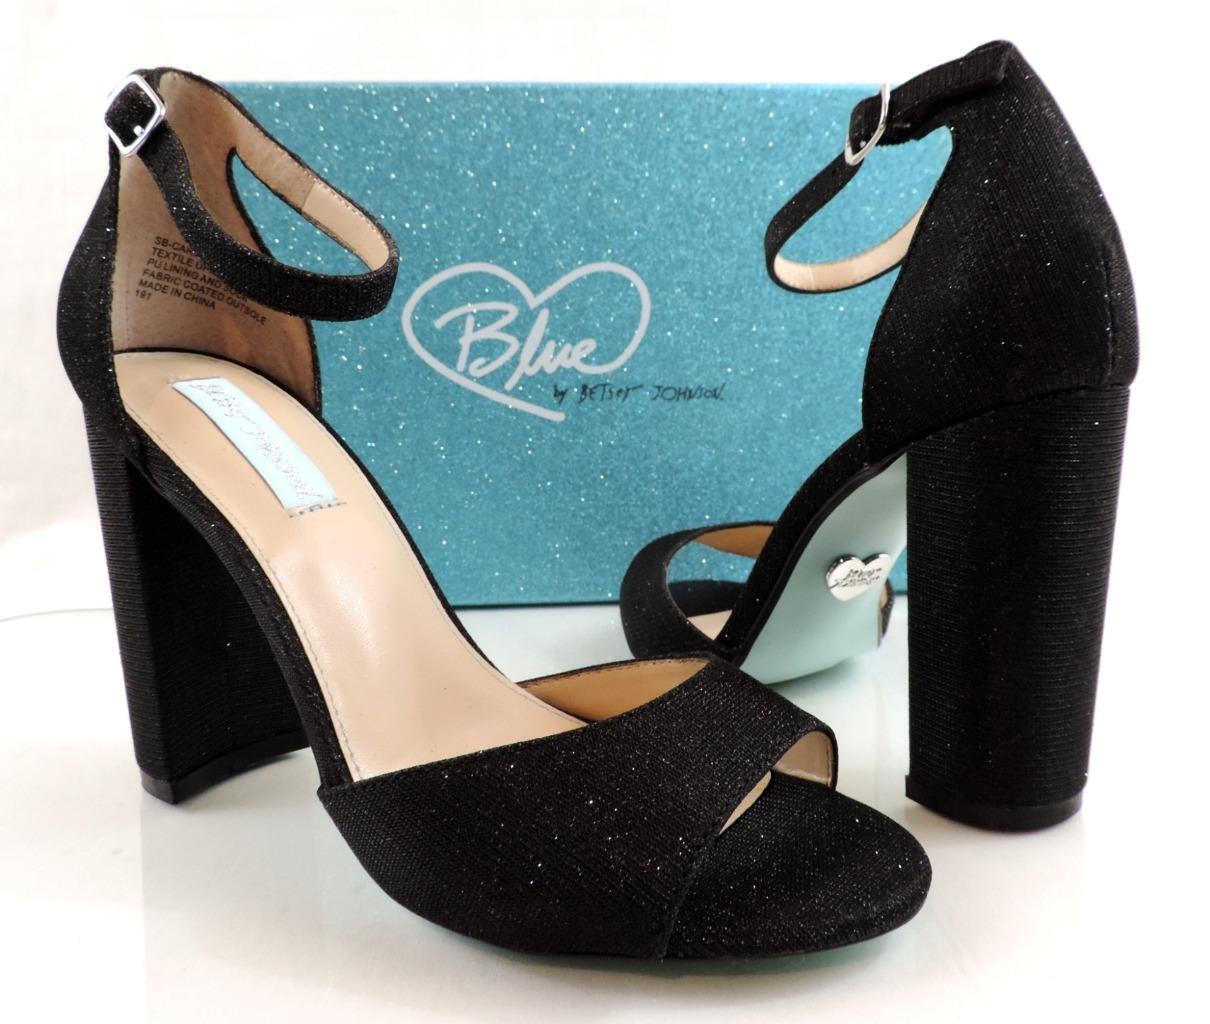 blu Betsey Johnson Carley Ankle Strap Block Heels Dress Dress Dress Sandals nero Dimensione 10 693ee5